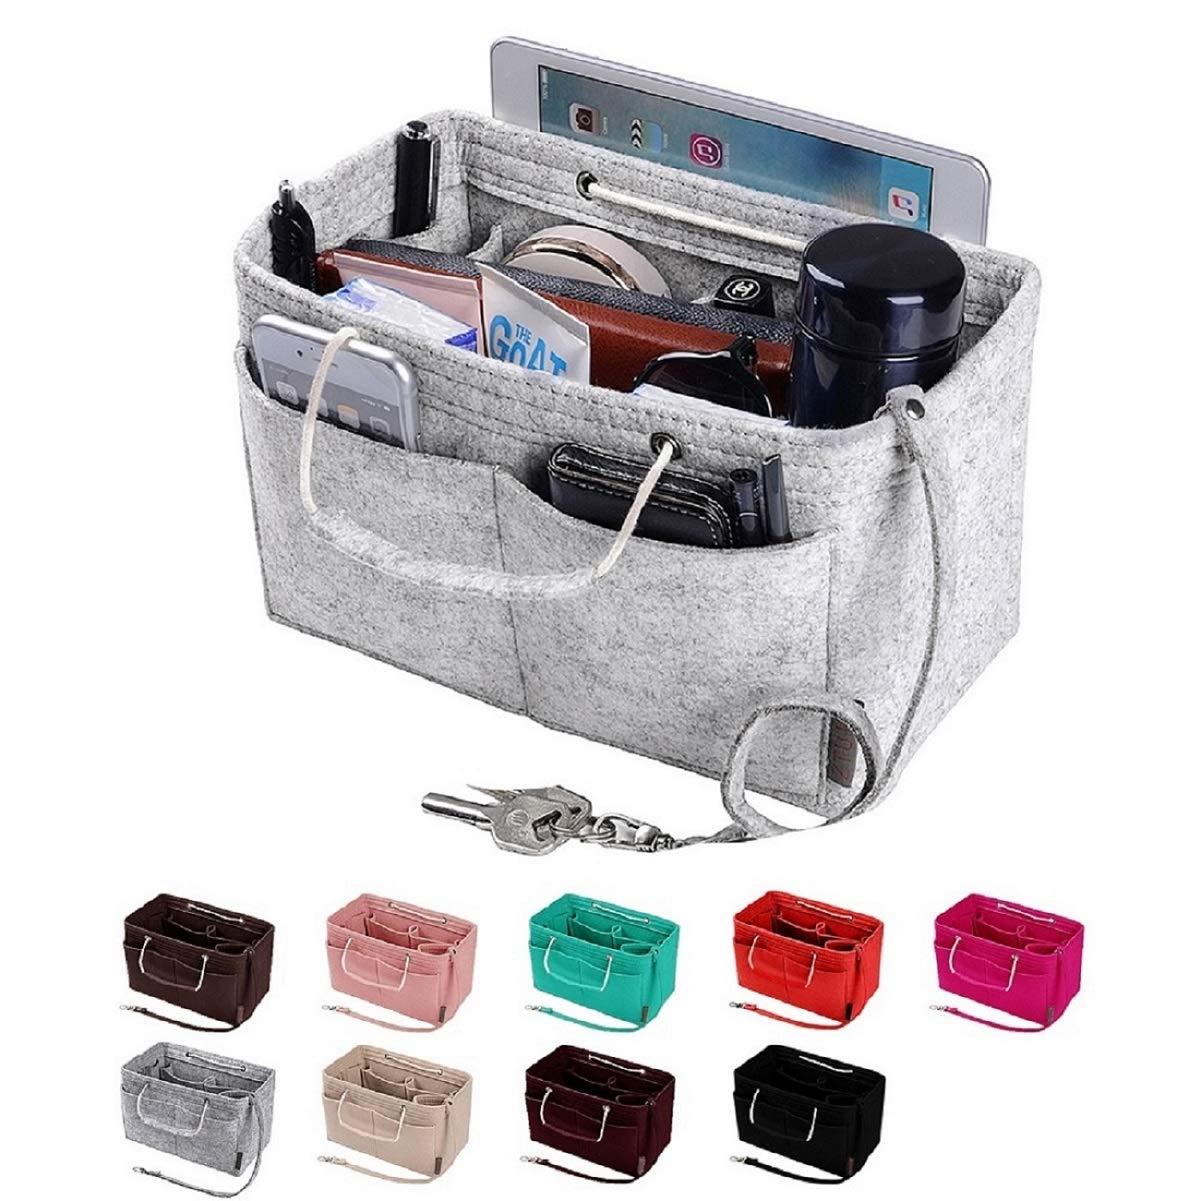 Purse Organizer, Multi-Pocket Felt Handbag Organizer, Purse Insert Organizer with Handles, Medium, Large (Medium, Grey) by ZTUJO